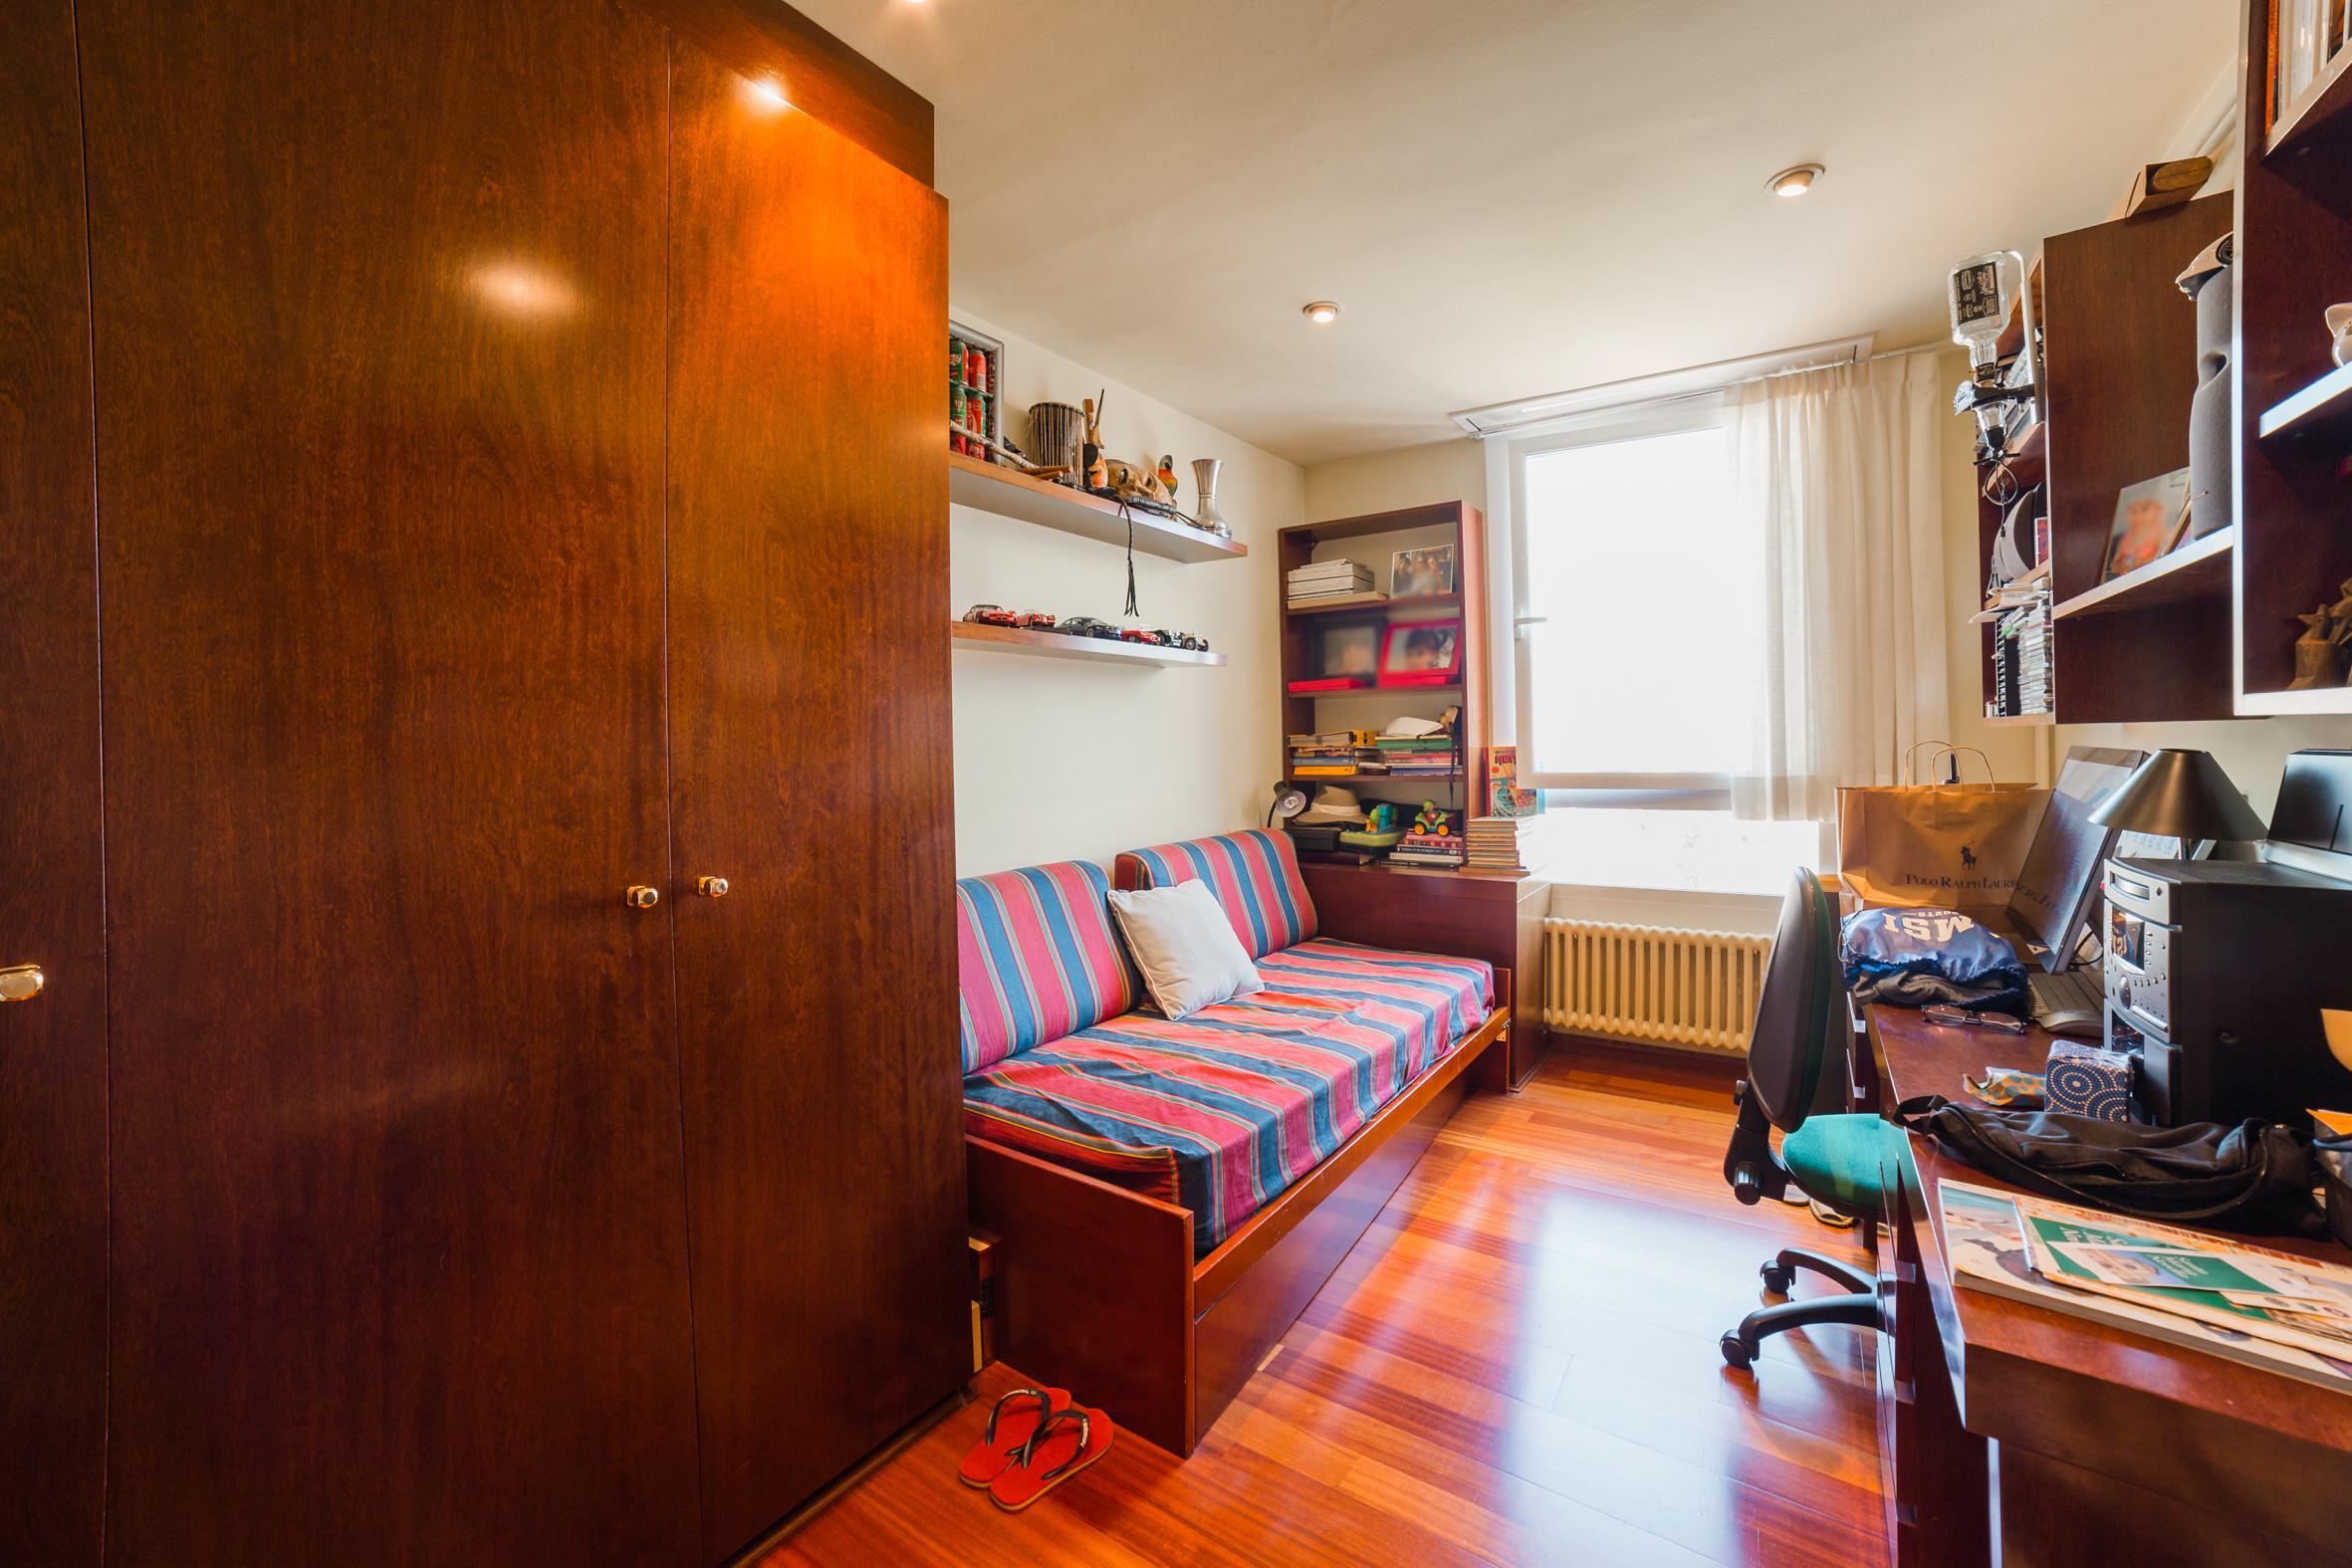 253515 Apartamento en venta en Sarrià-Sant Gervasi, Sant Gervasi-Galvany 21